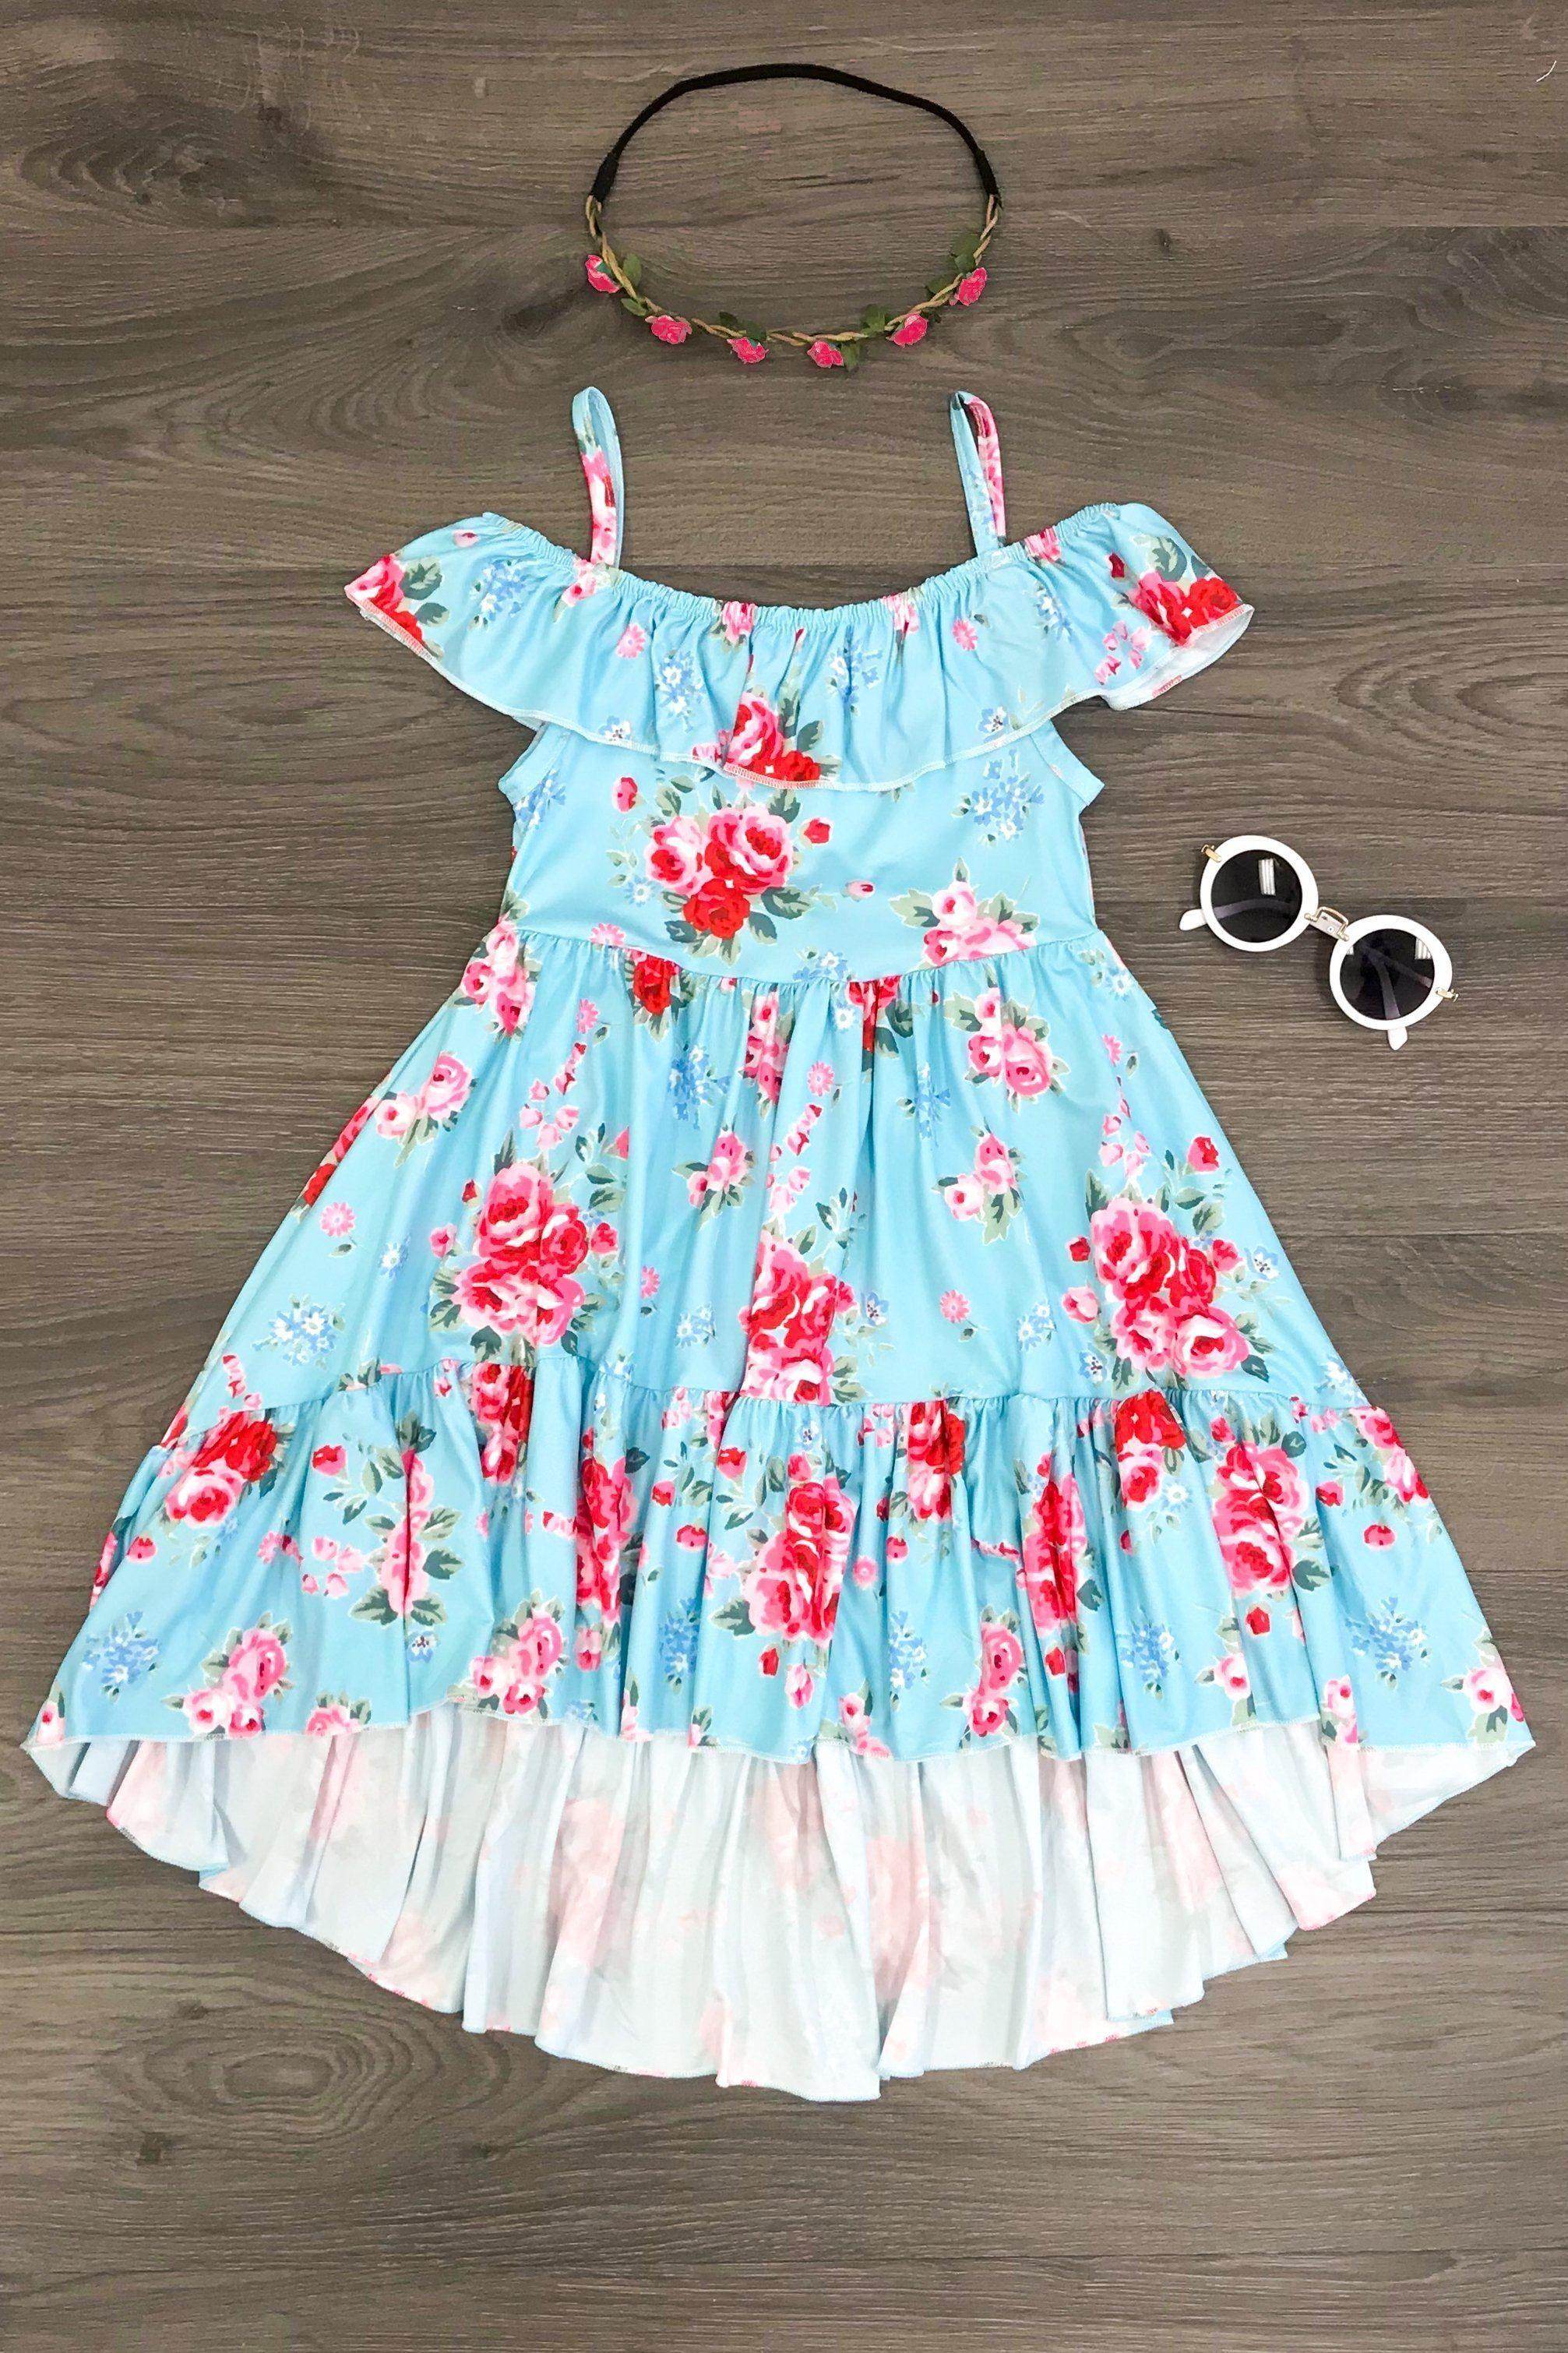 605a44b1ad5 Blue Floral High Low Dress